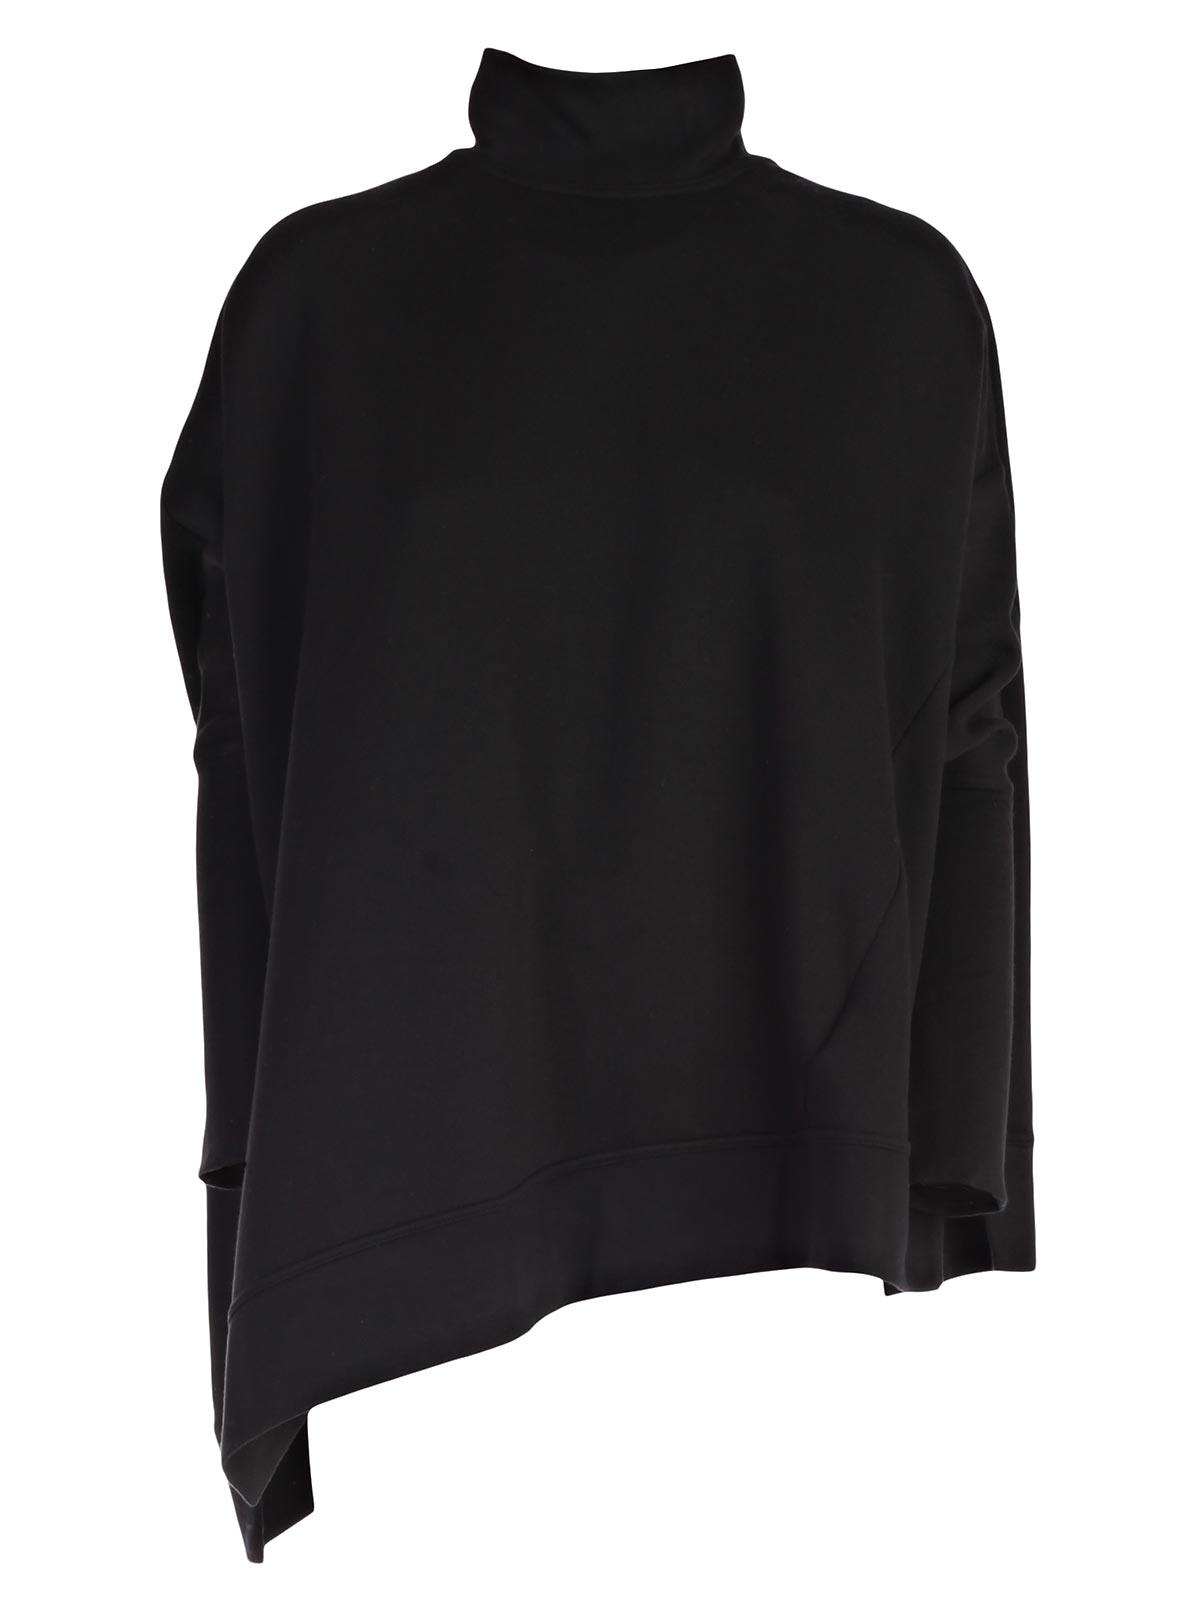 Picture of ANN DEMEULEMESTER SweatShirt